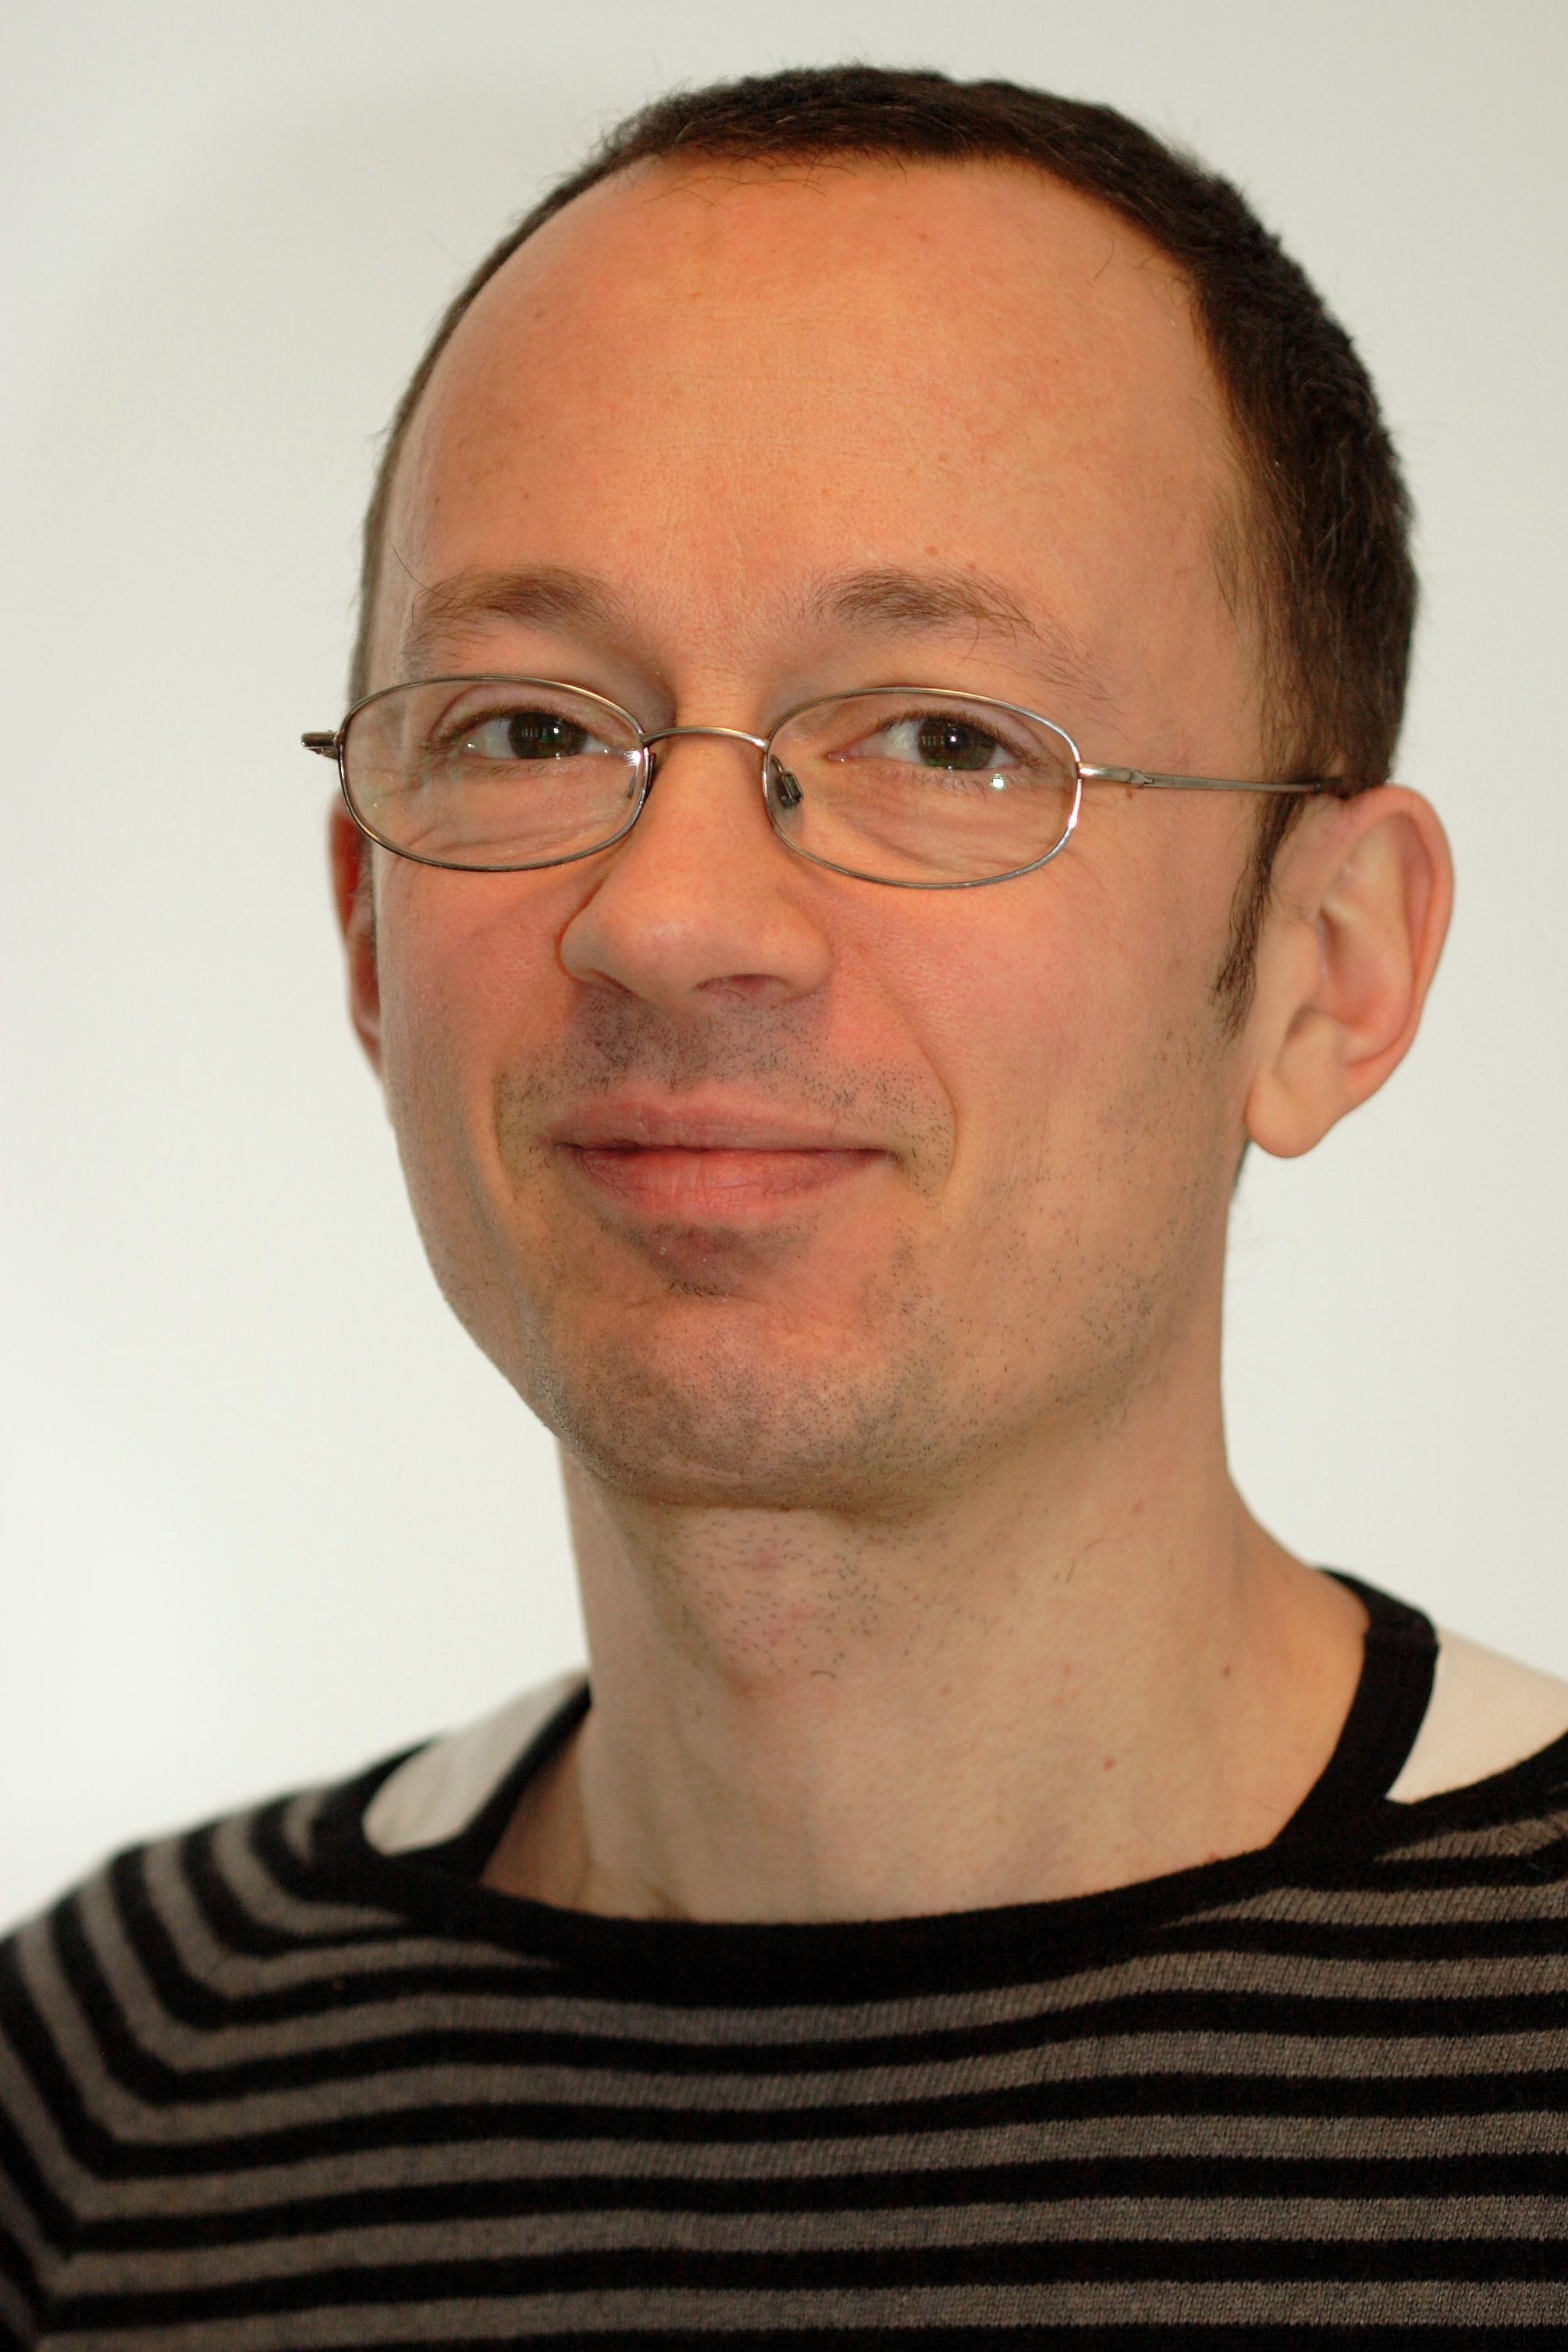 Rasmus Ejrnæs